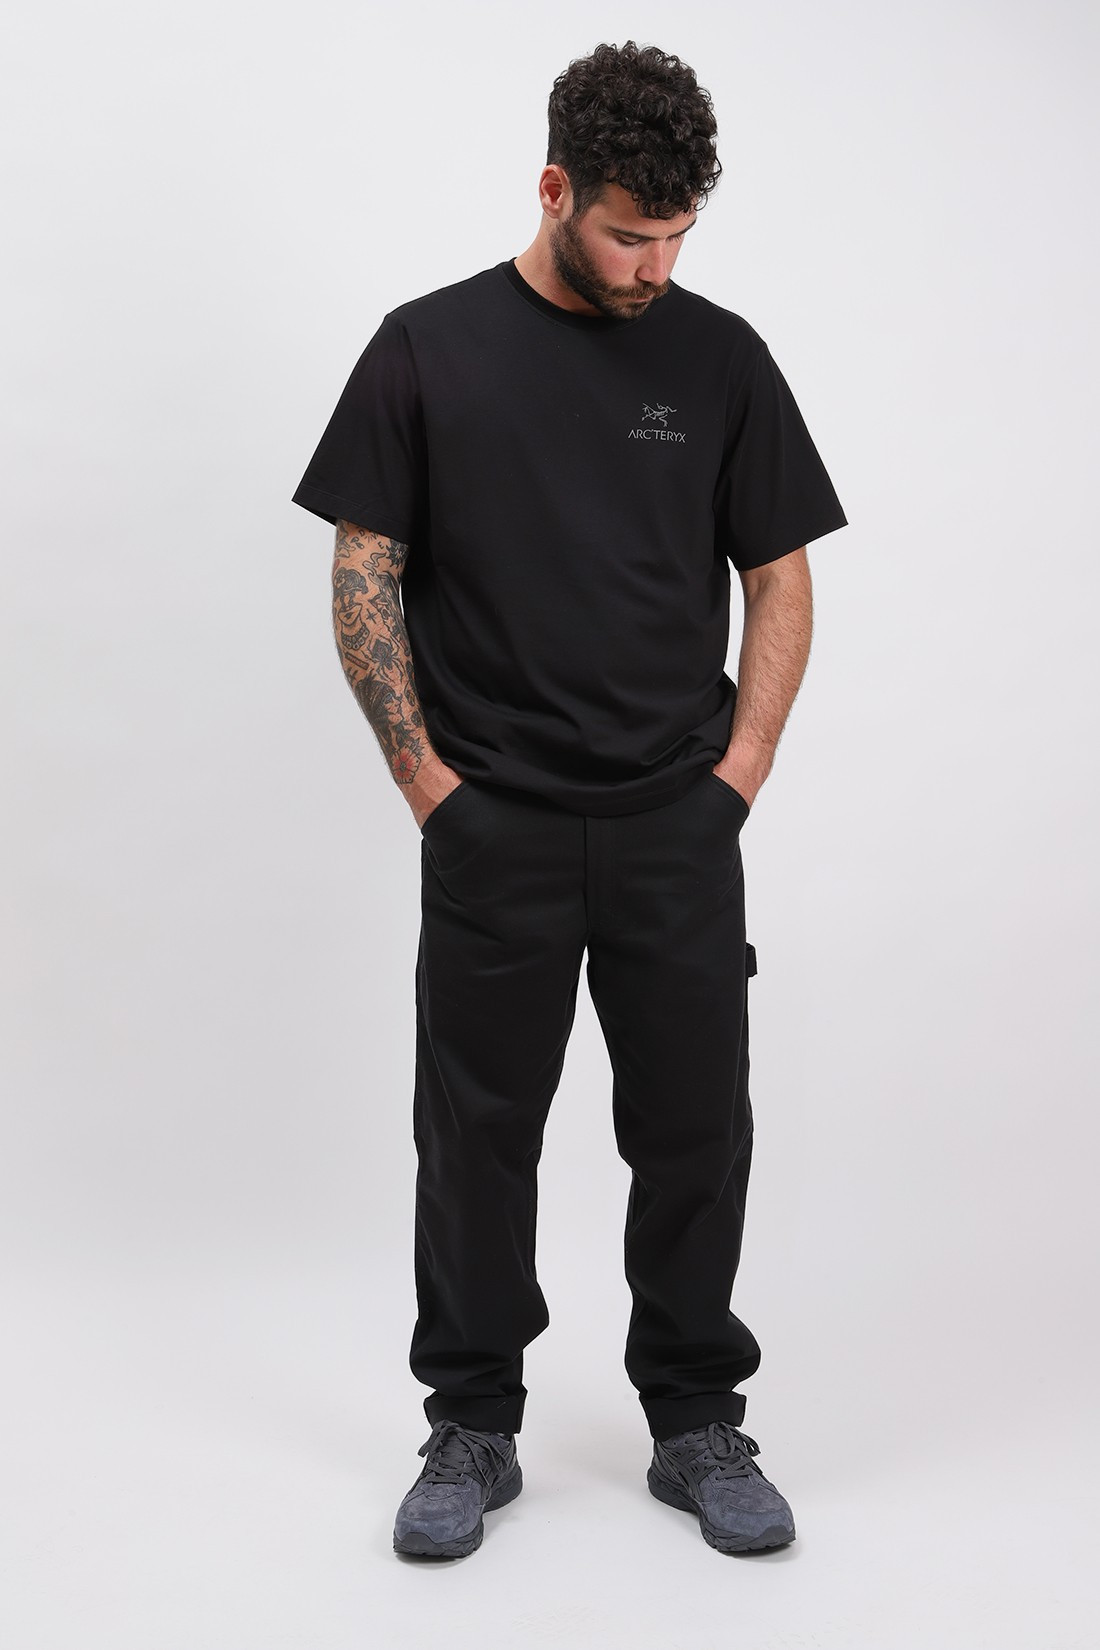 ARC'TERYX / Emblem tshirt ss mens Black